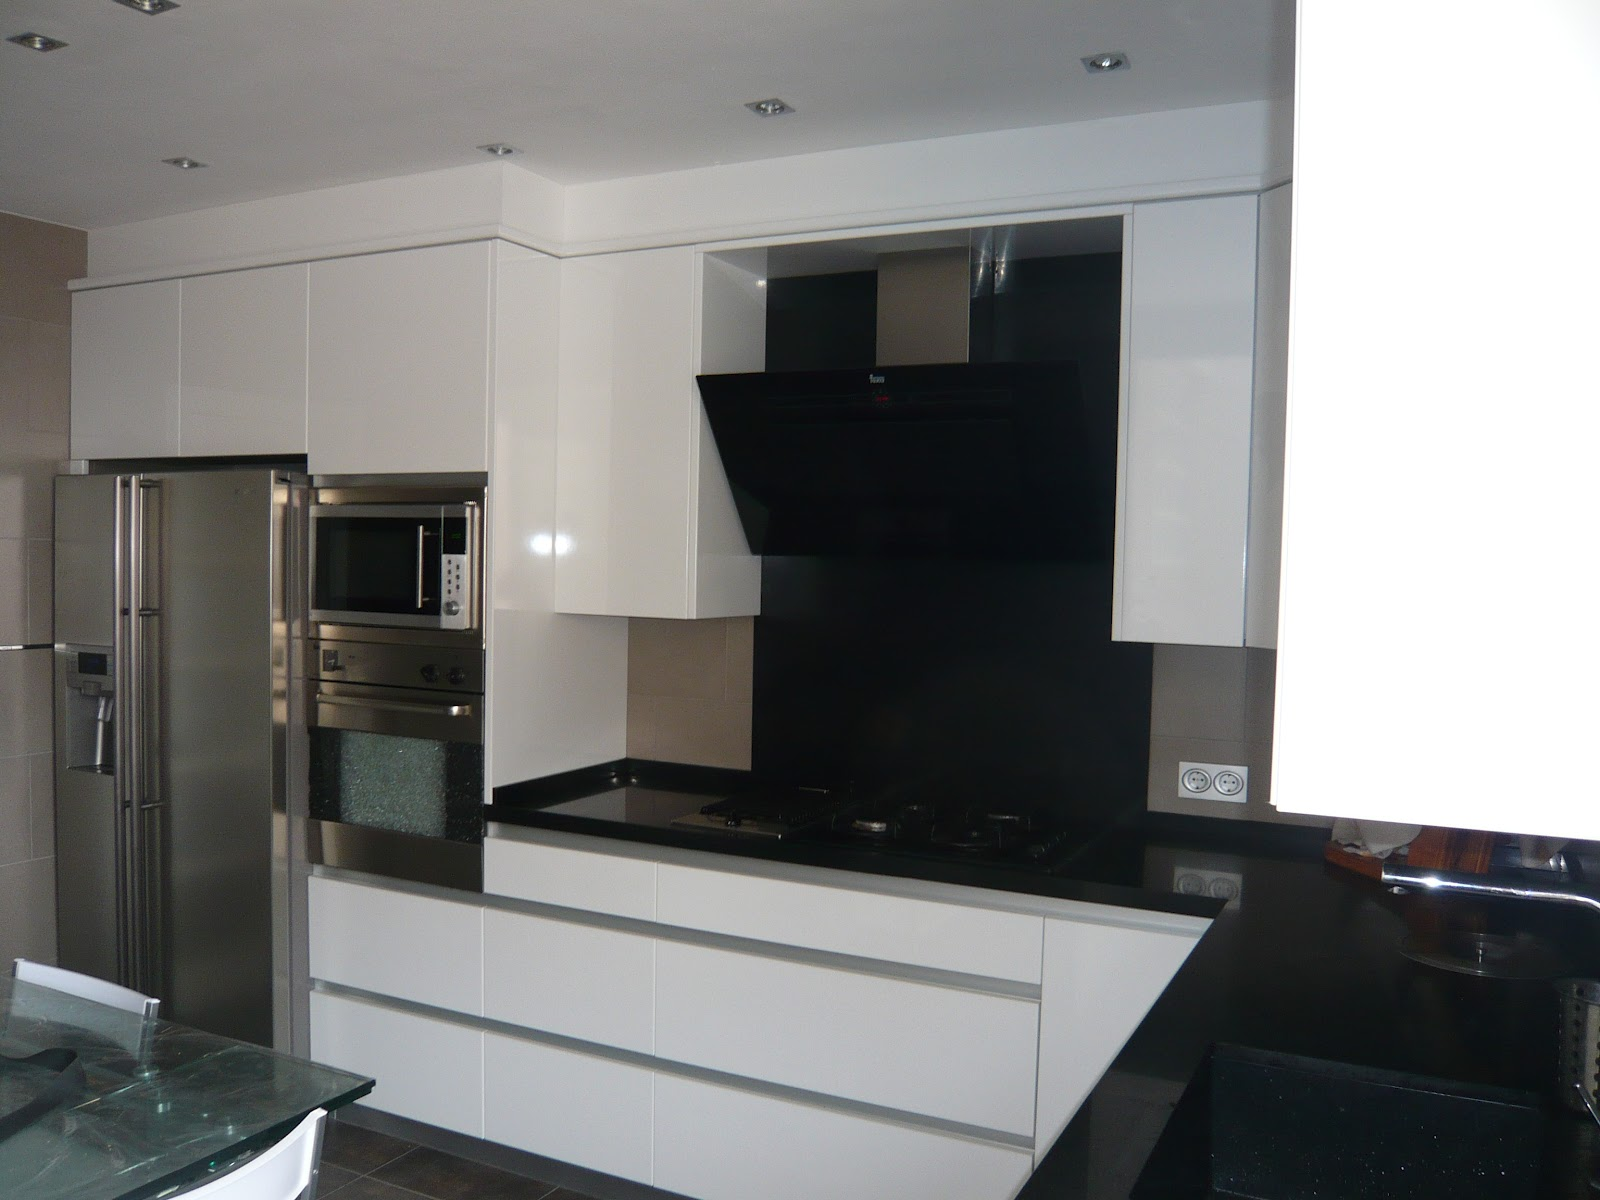 Reuscuina muebles de cocina blanco brillo sin tiradores - Muebles de cocina merkamueble ...